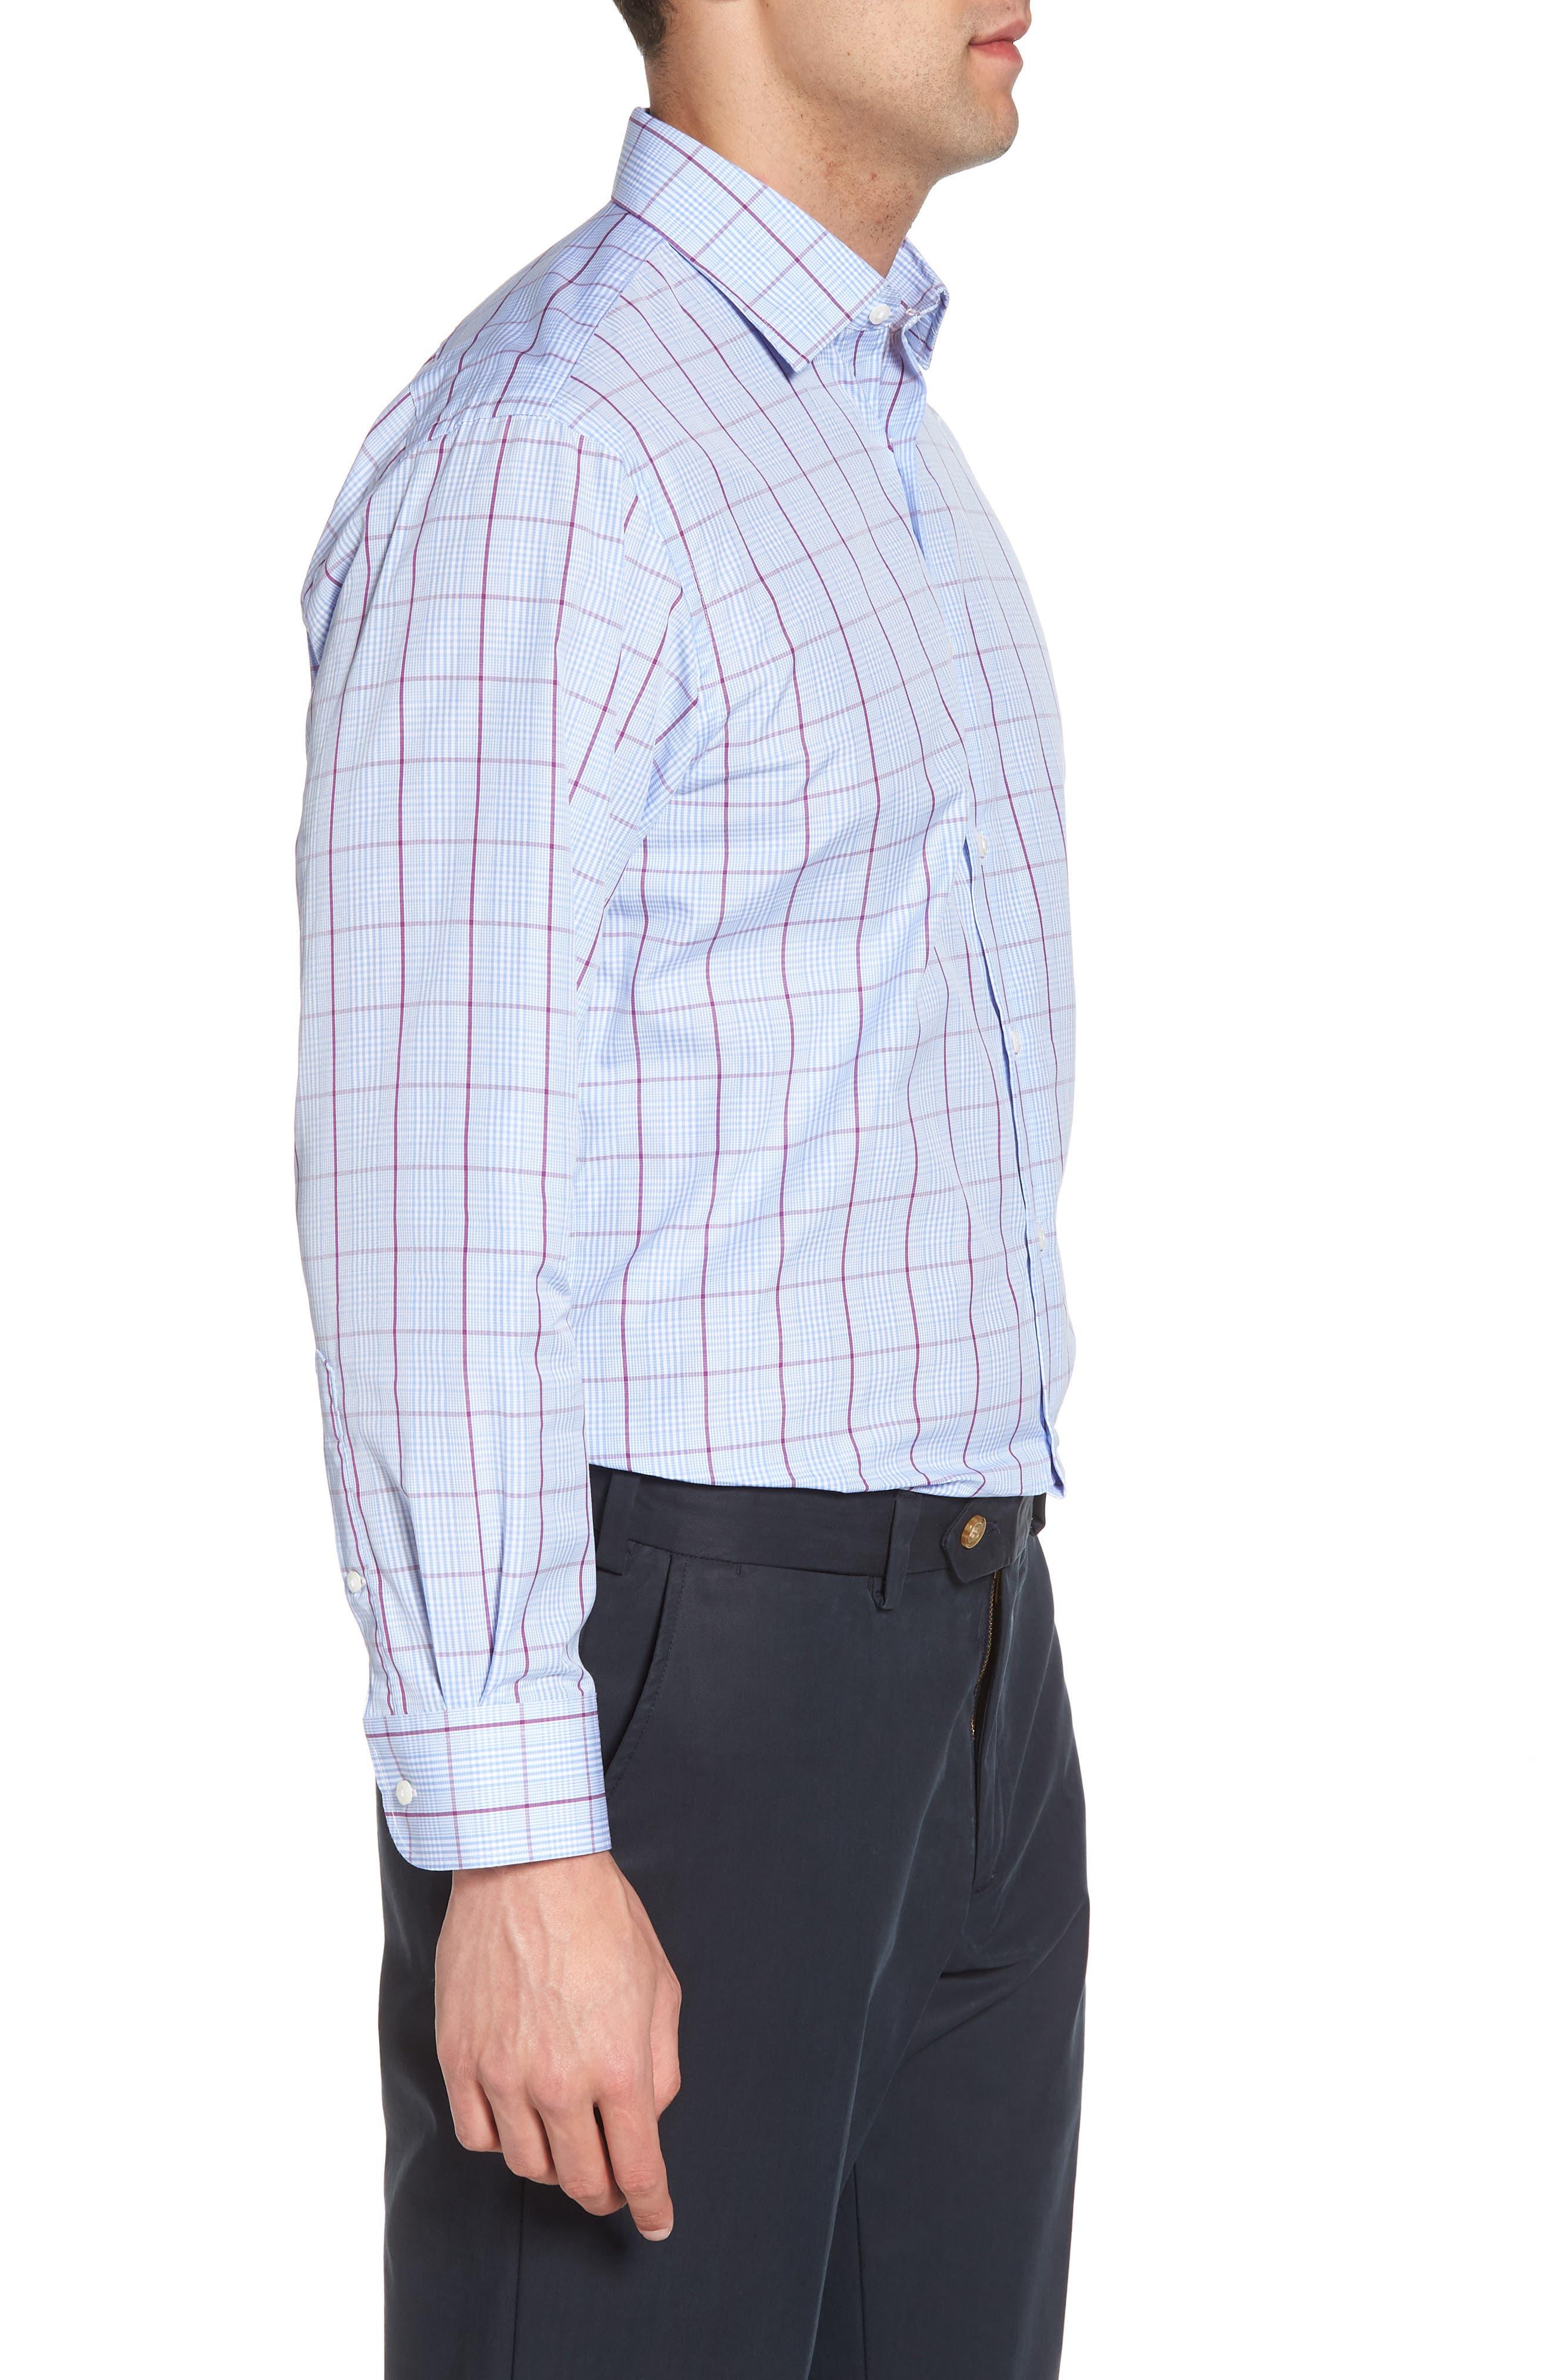 Alternate Image 3  - Nordstrom Men's Shop Traditional Fit Plaid Dress Shirt